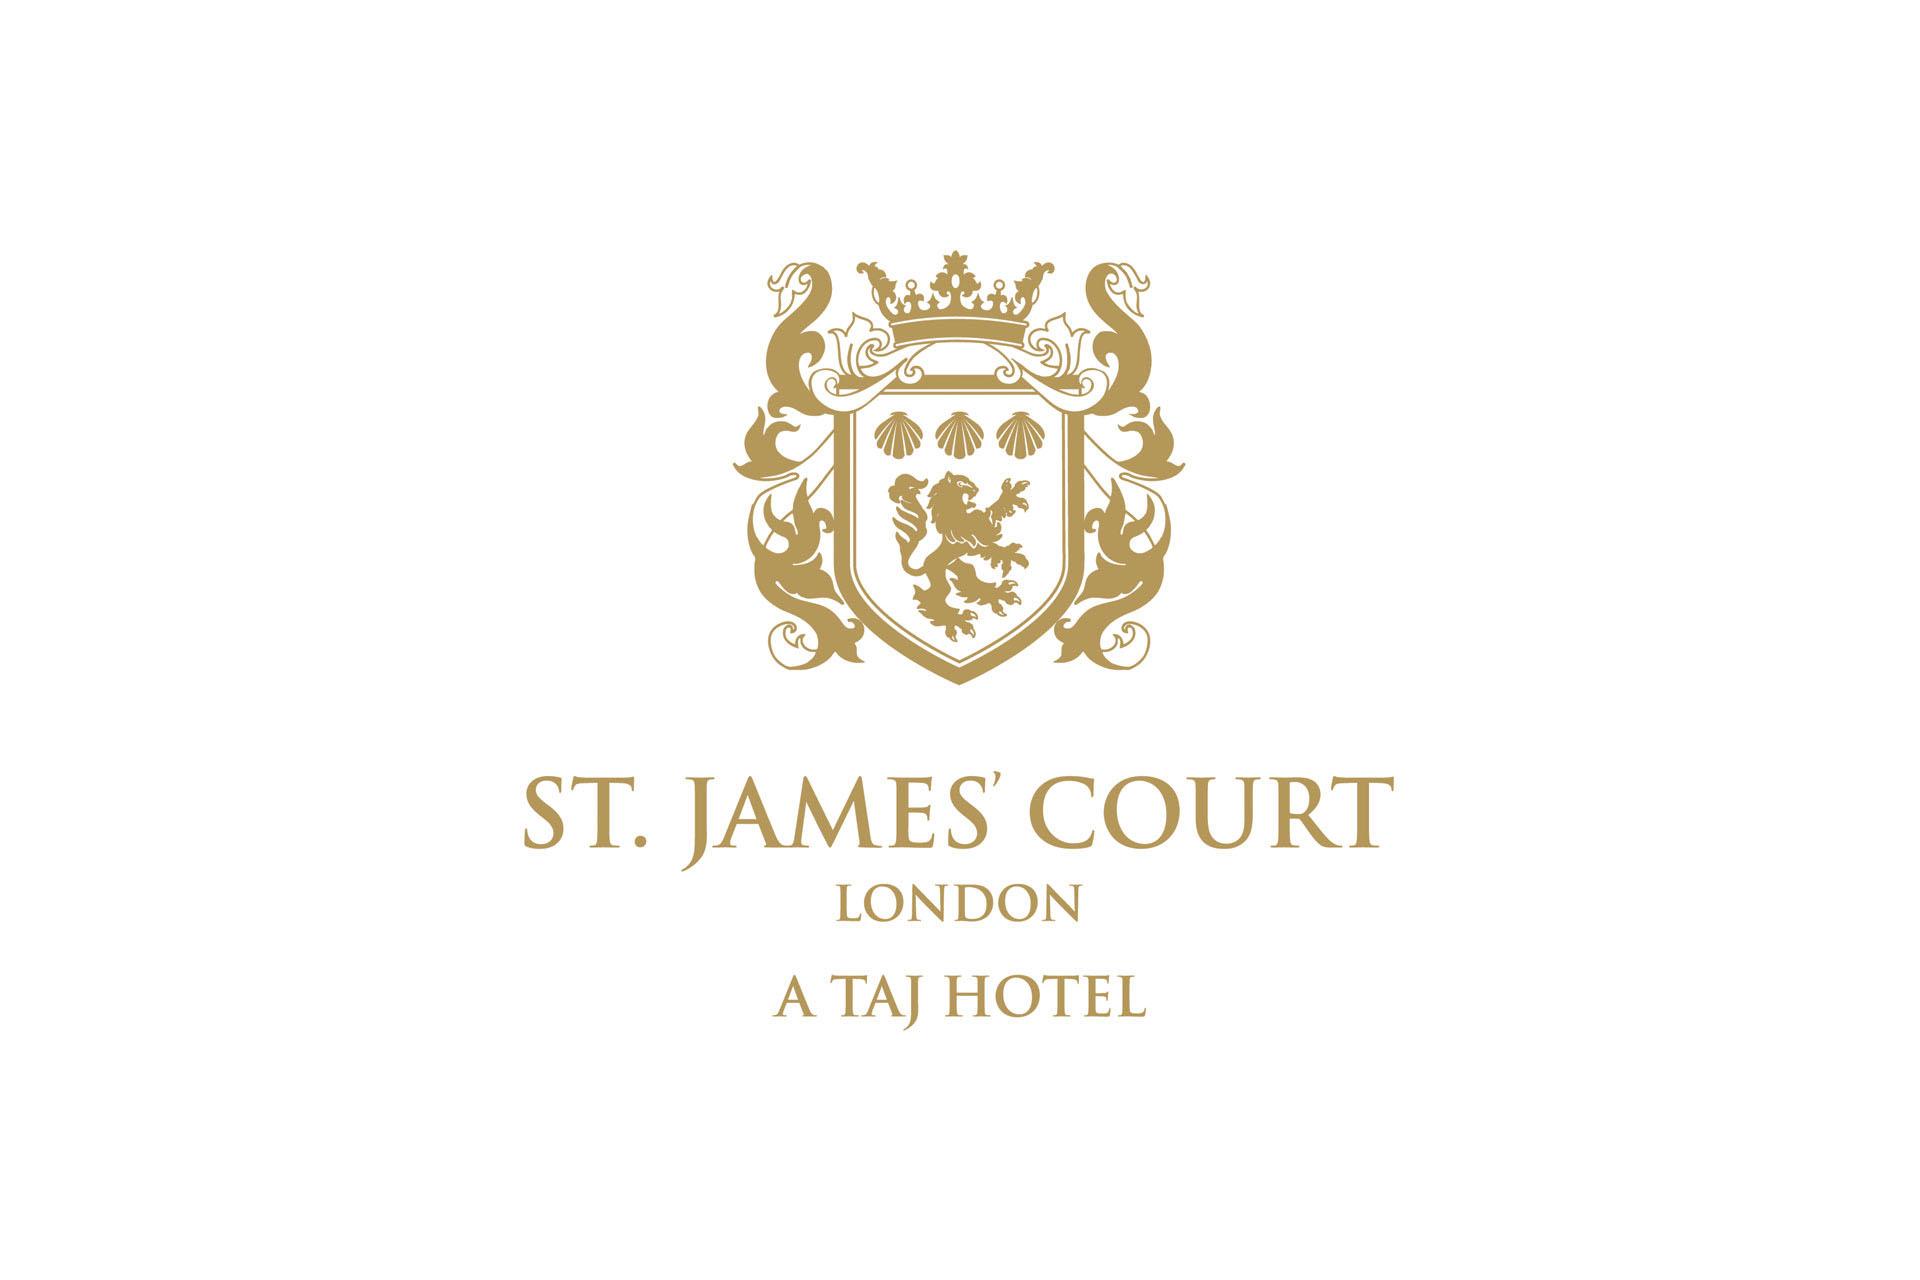 St. James Court